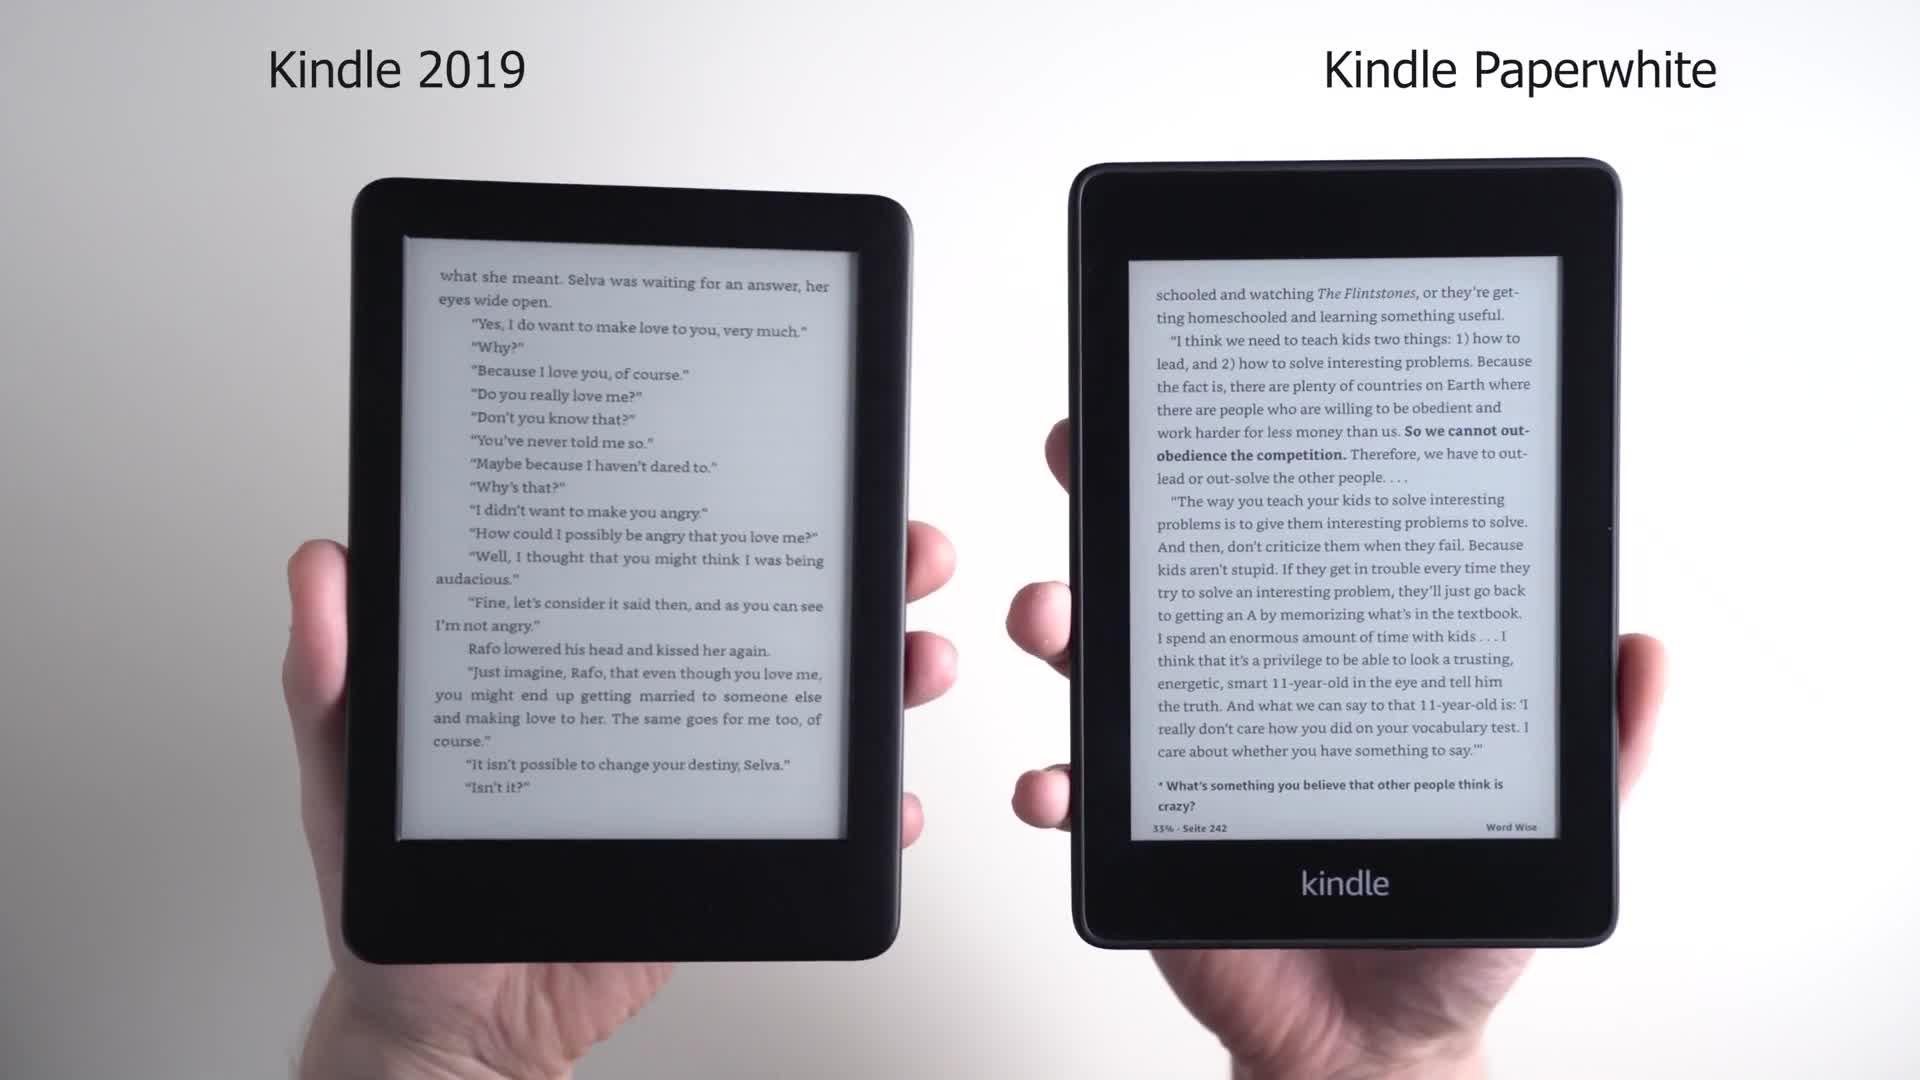 Amazon, Test, Kindle, E-Book, Andrzej Tokarski, Tabletblog, E-Book-Reader, Amazon Kindle, Vergleich, E-Book-Lesegerät, E-Book-Reader Kindle, Kindle Paperwhite, Paperwhite, Amazon Kindle 2019